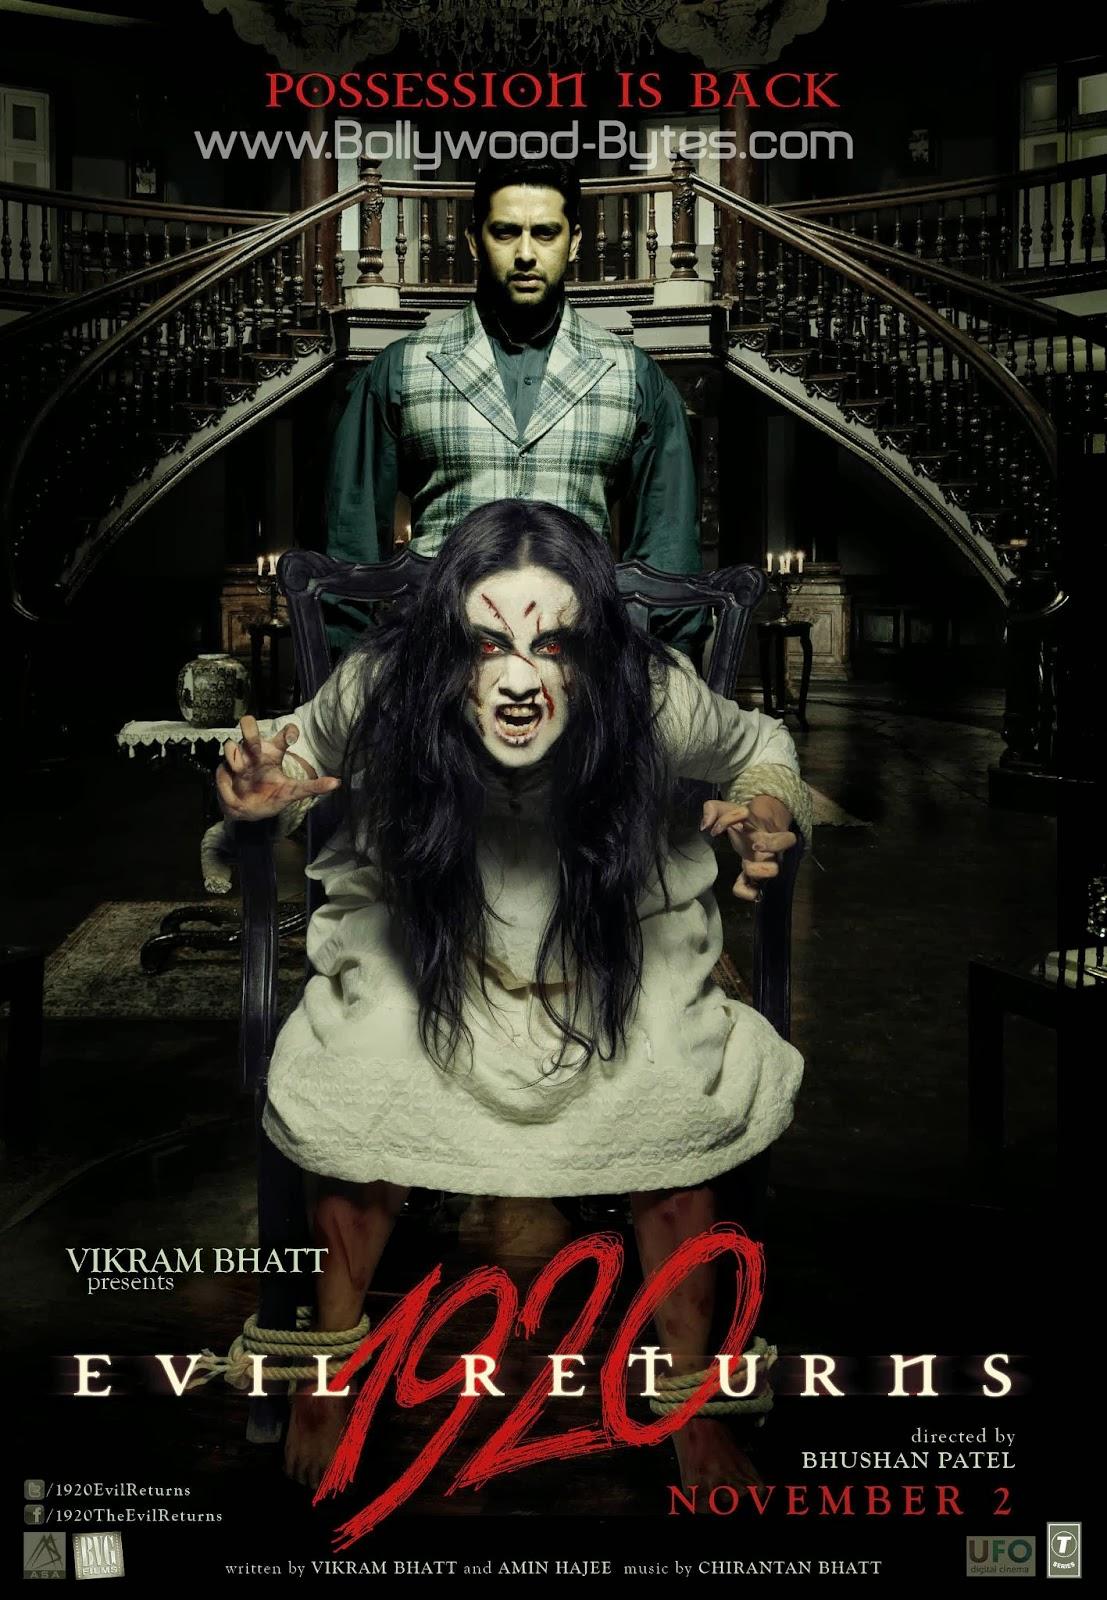 1920-evil returns mp3 songs- bollywood movie ~ madhur sangeet